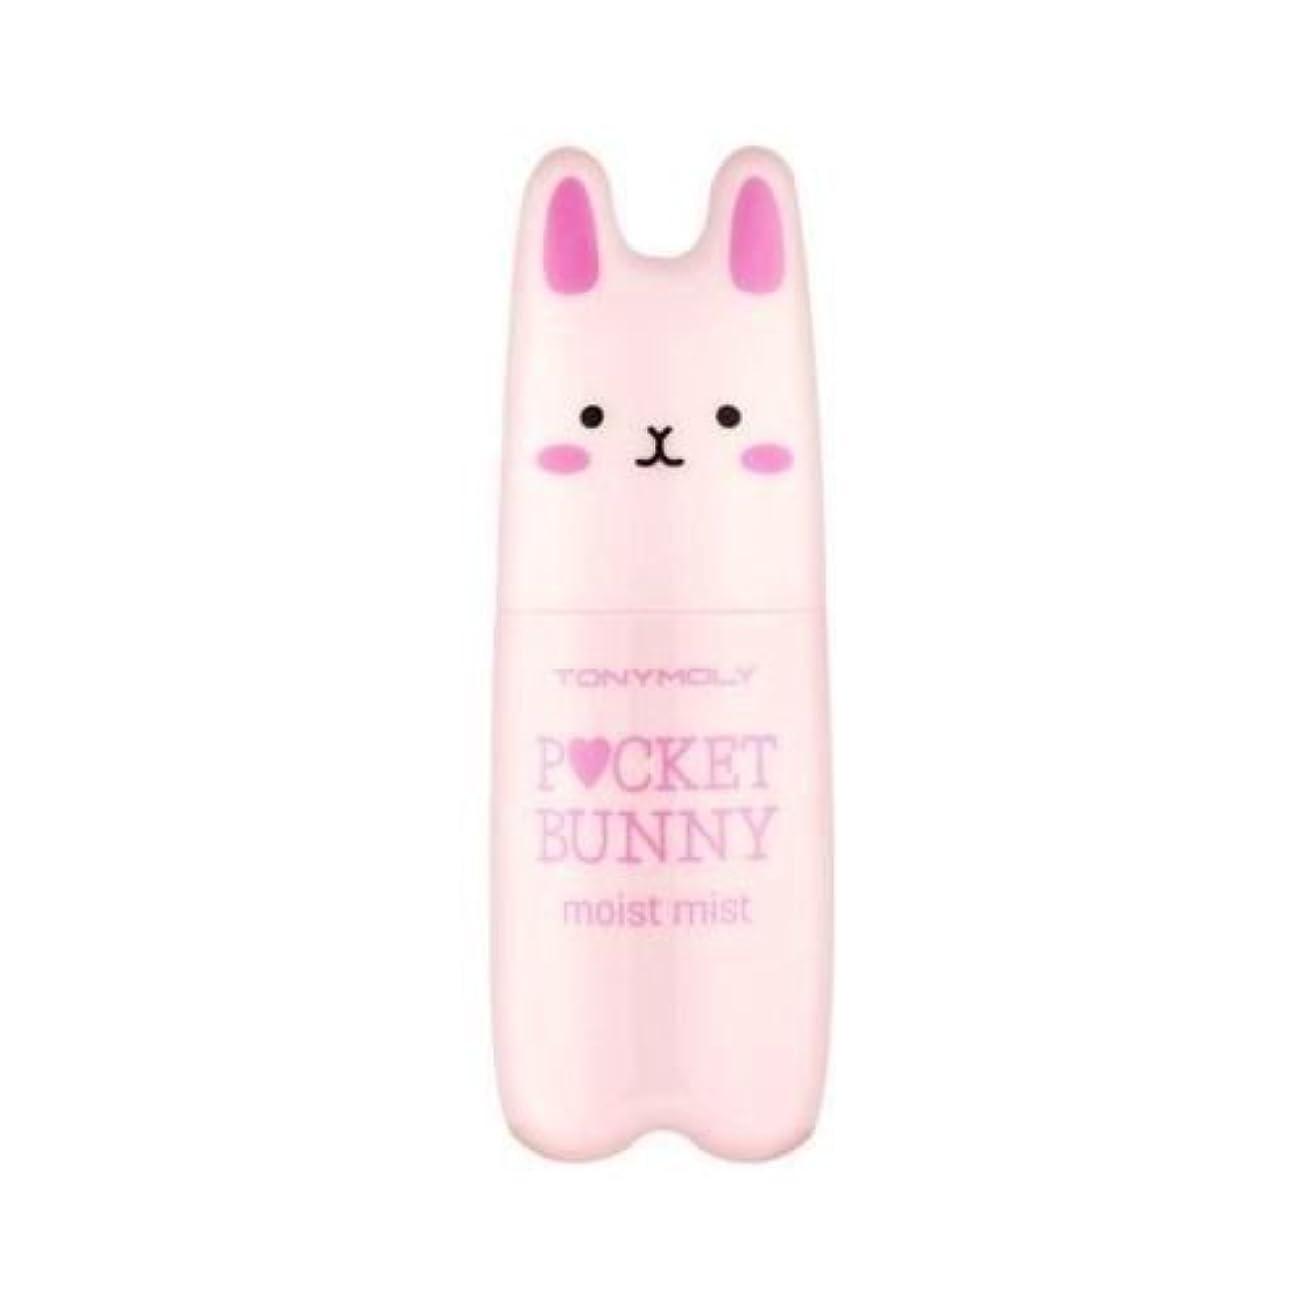 (6 Pack) TONYMOLY Pocket Bunny Moist Mist (並行輸入品)